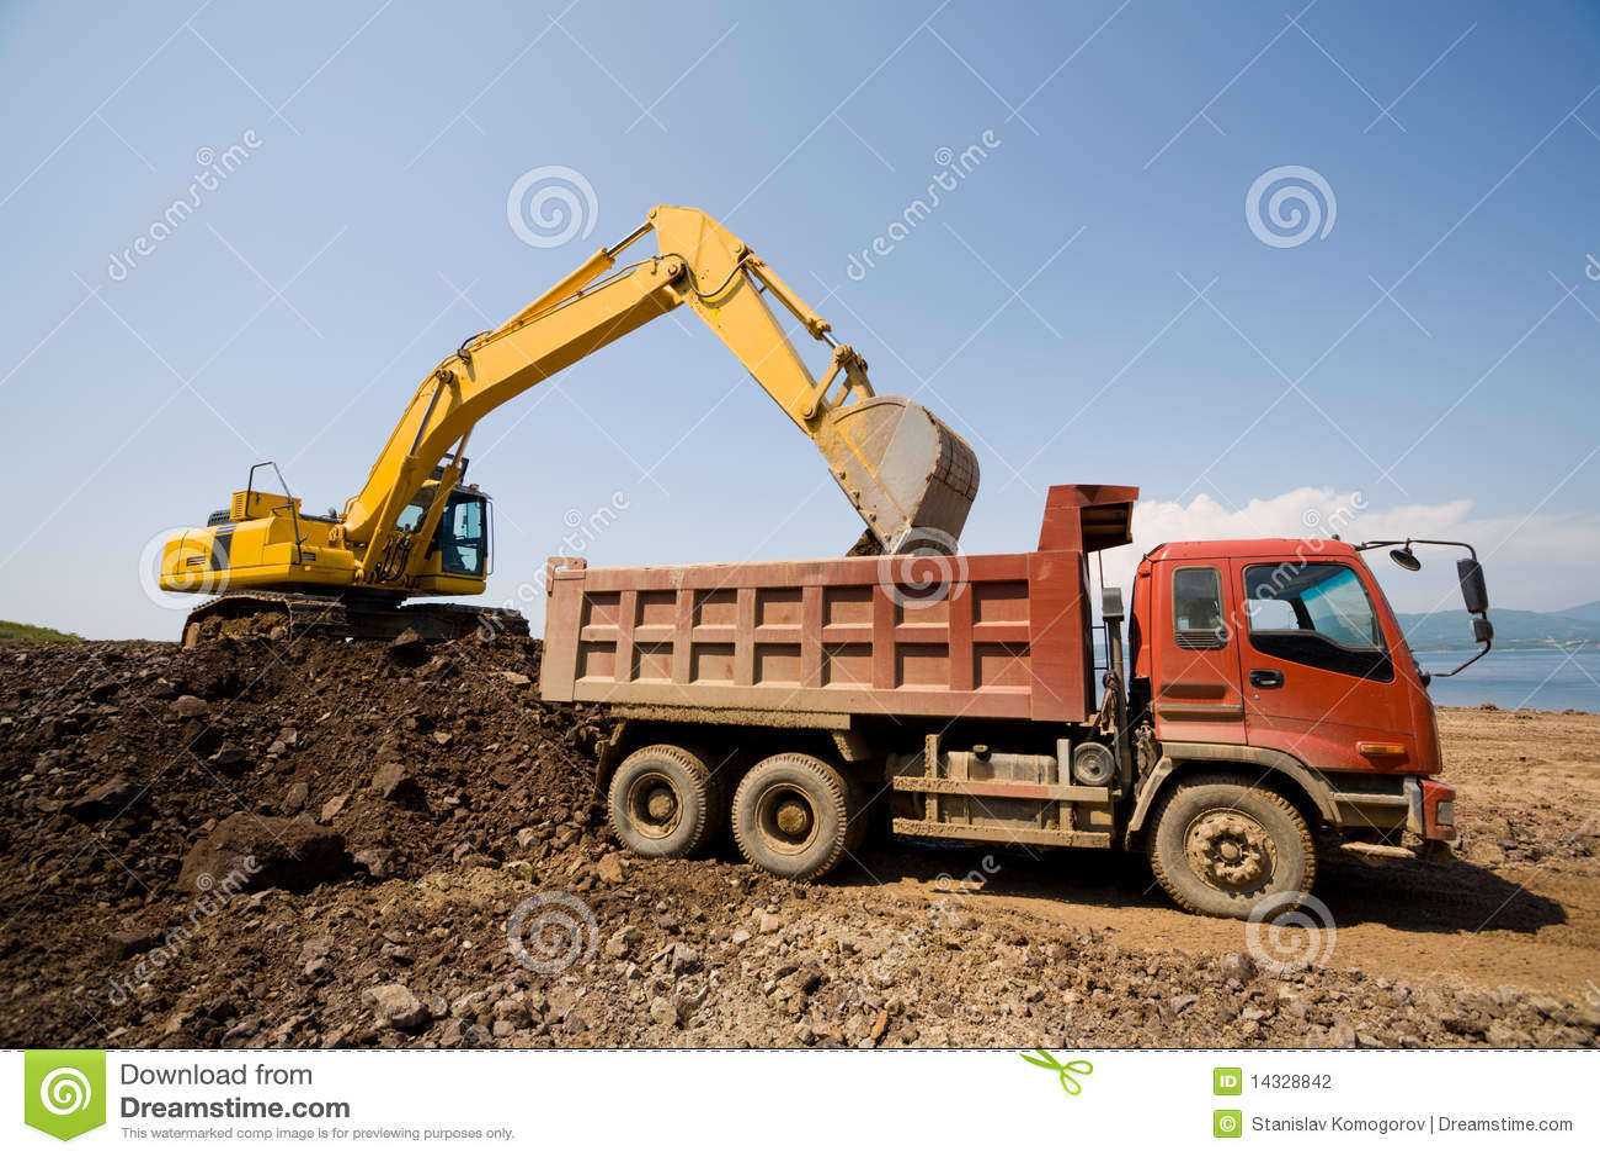 Excavator and heavy dump truck